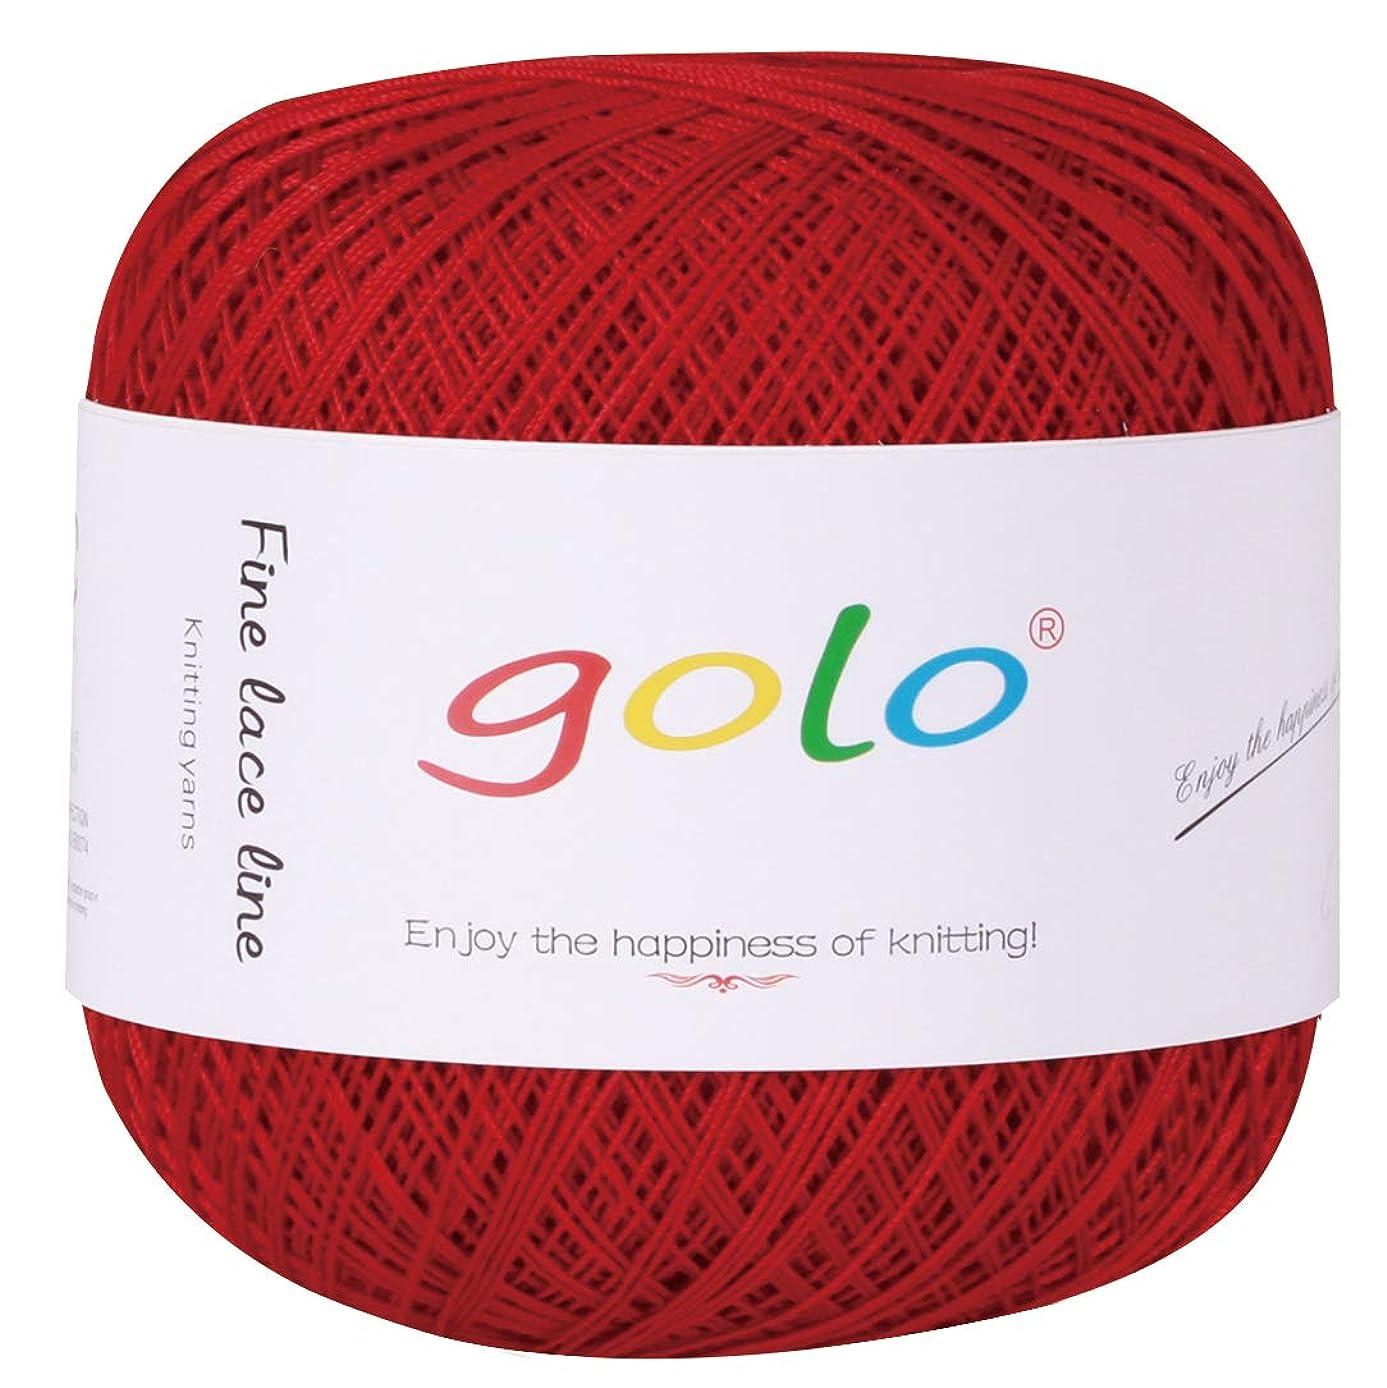 Crochet Thread Yarns for Begingers Size10-100% Contton Yarn for Knitting Crochet DIY Hardanger Cross Sitch Crochet Thread Balls Rainbow Turquoise 39 Colors Avilable (Red)